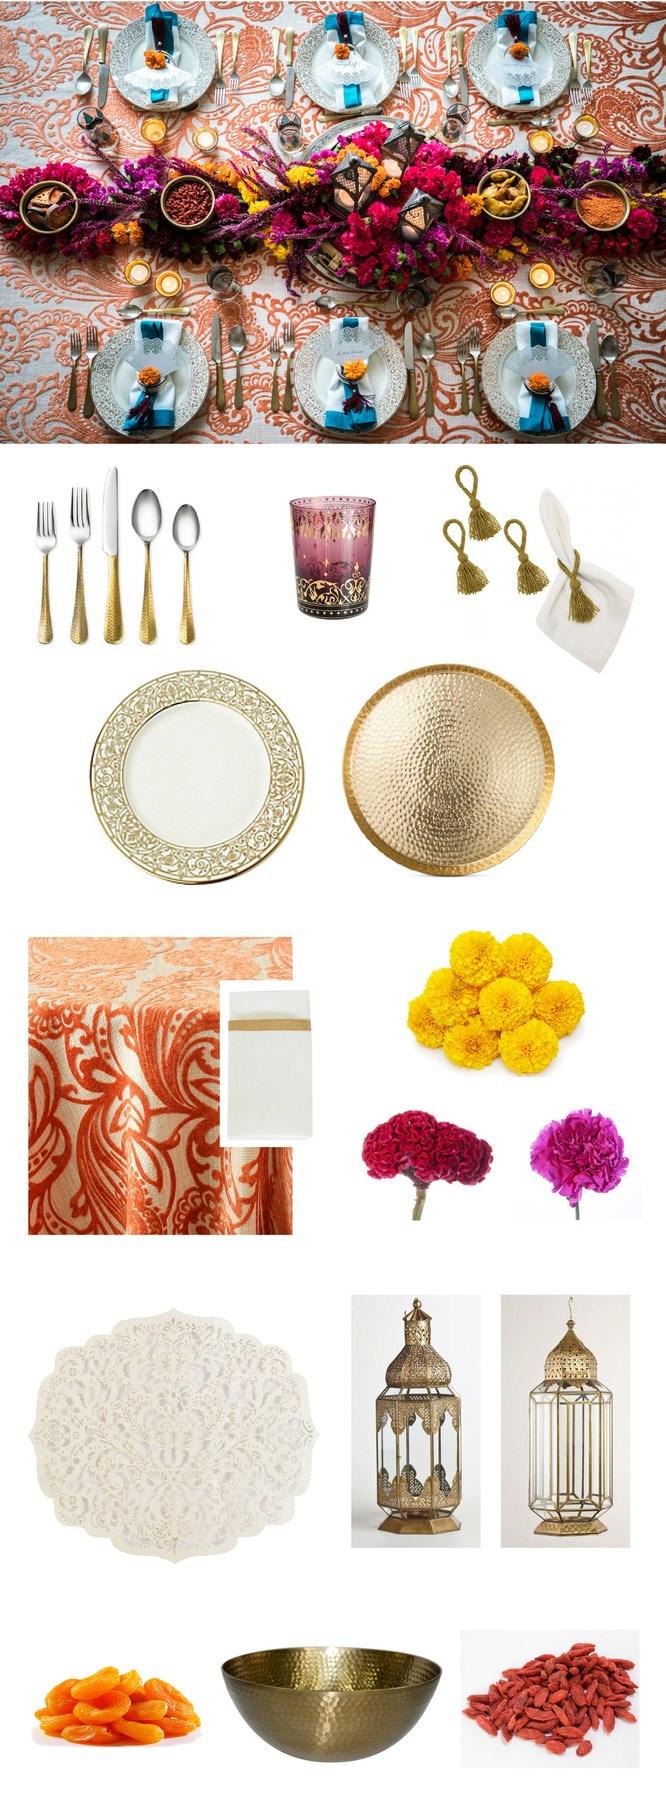 Nuage Designs - Diwali3